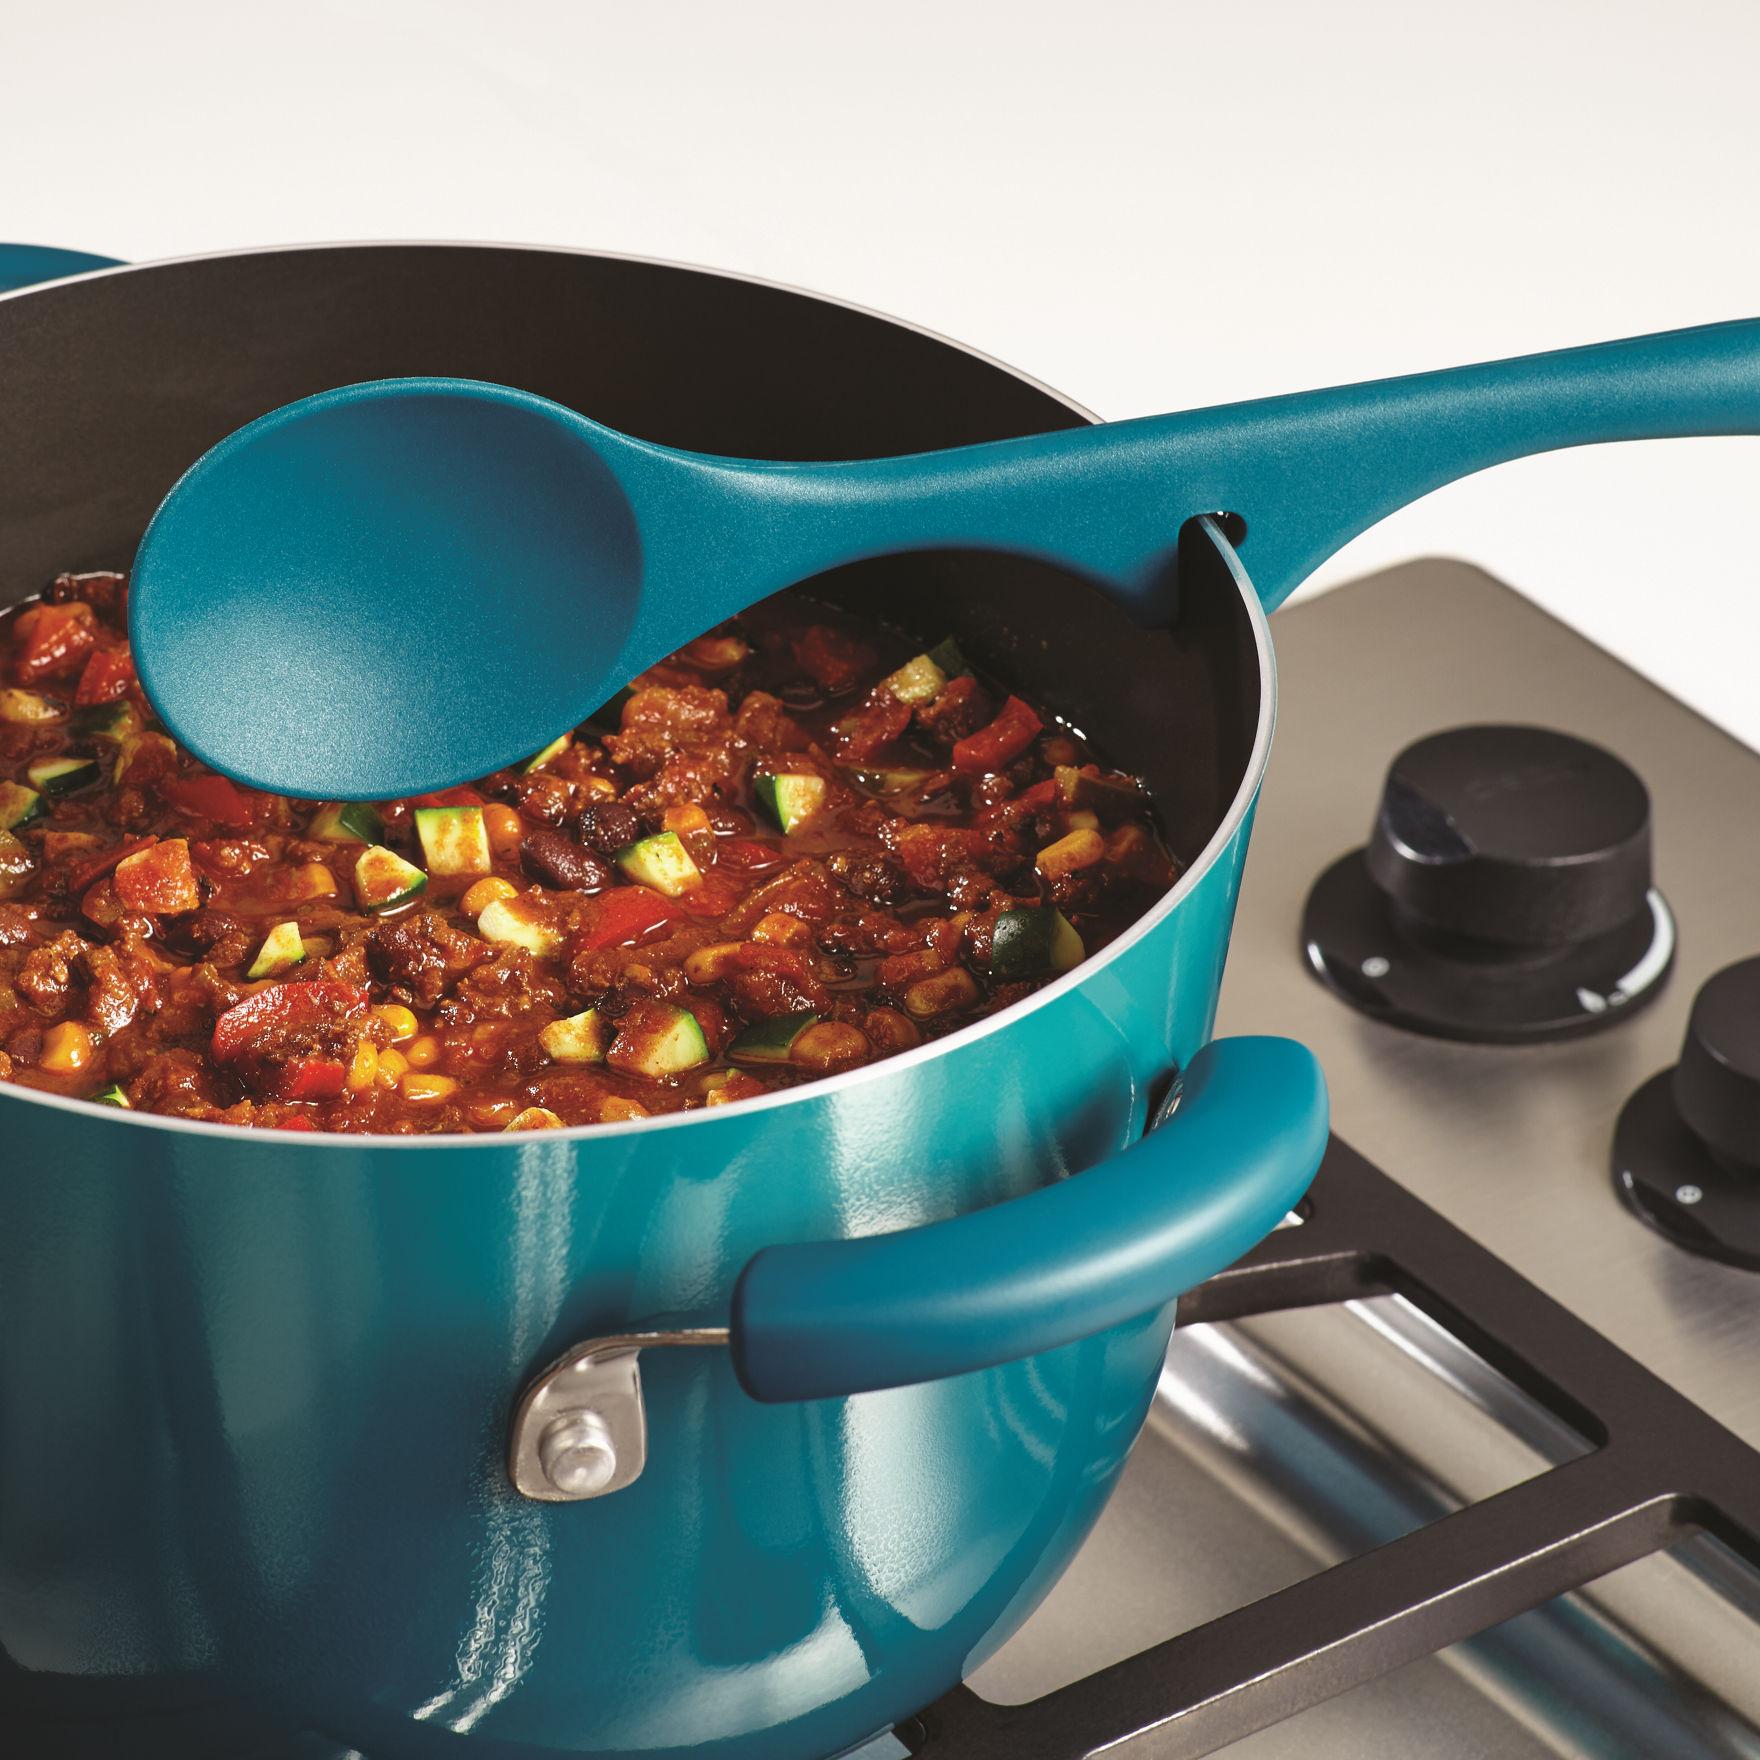 Rachael Ray Marine Blue Kitchen Utensils Cookware Prep & Tools